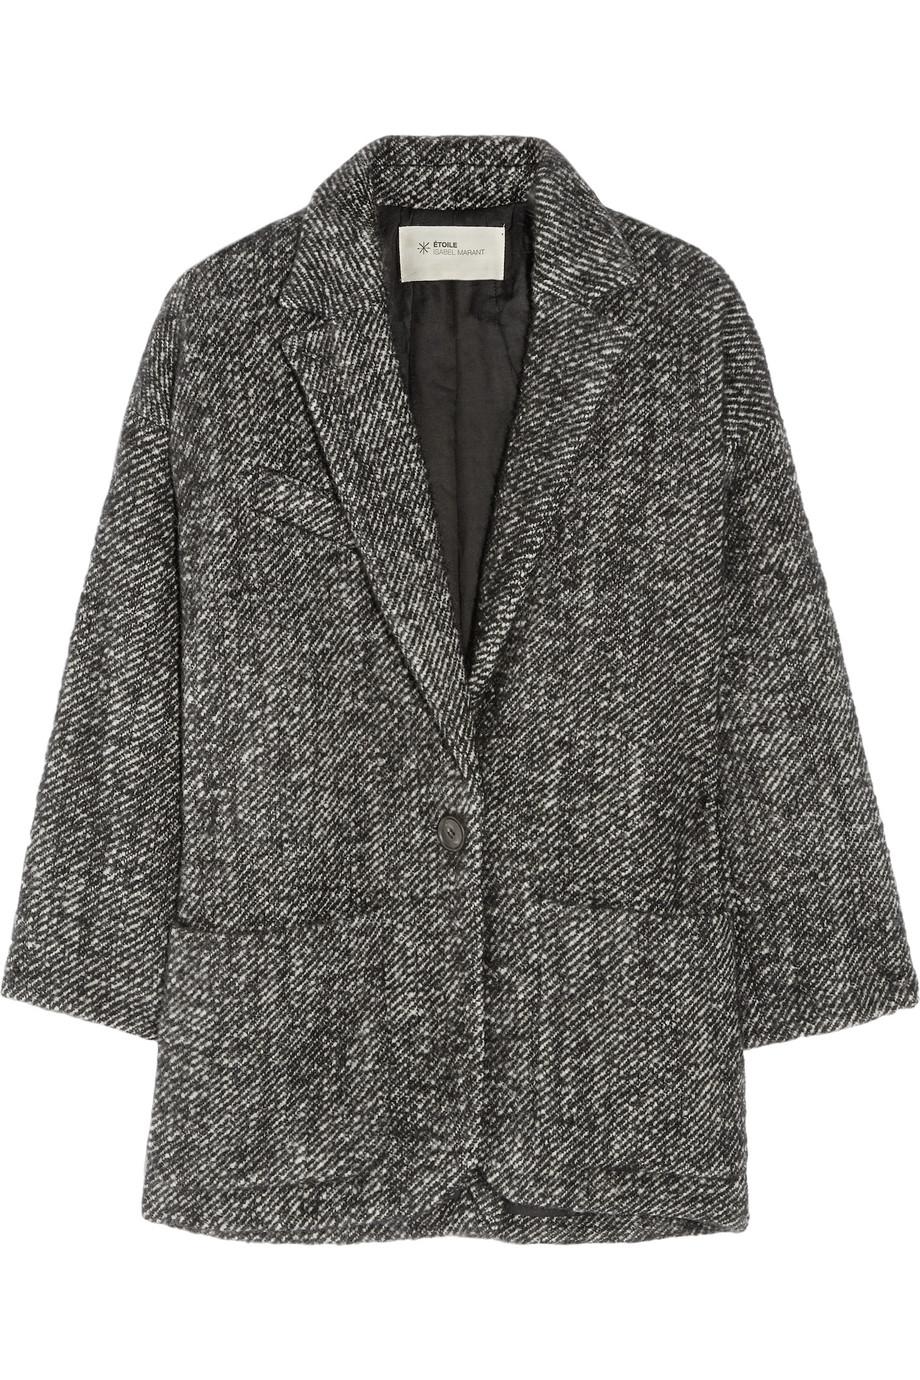 Lyst - Étoile Isabel Marant Xavier Bouclé Wool and Alpaca blend Coat in Black